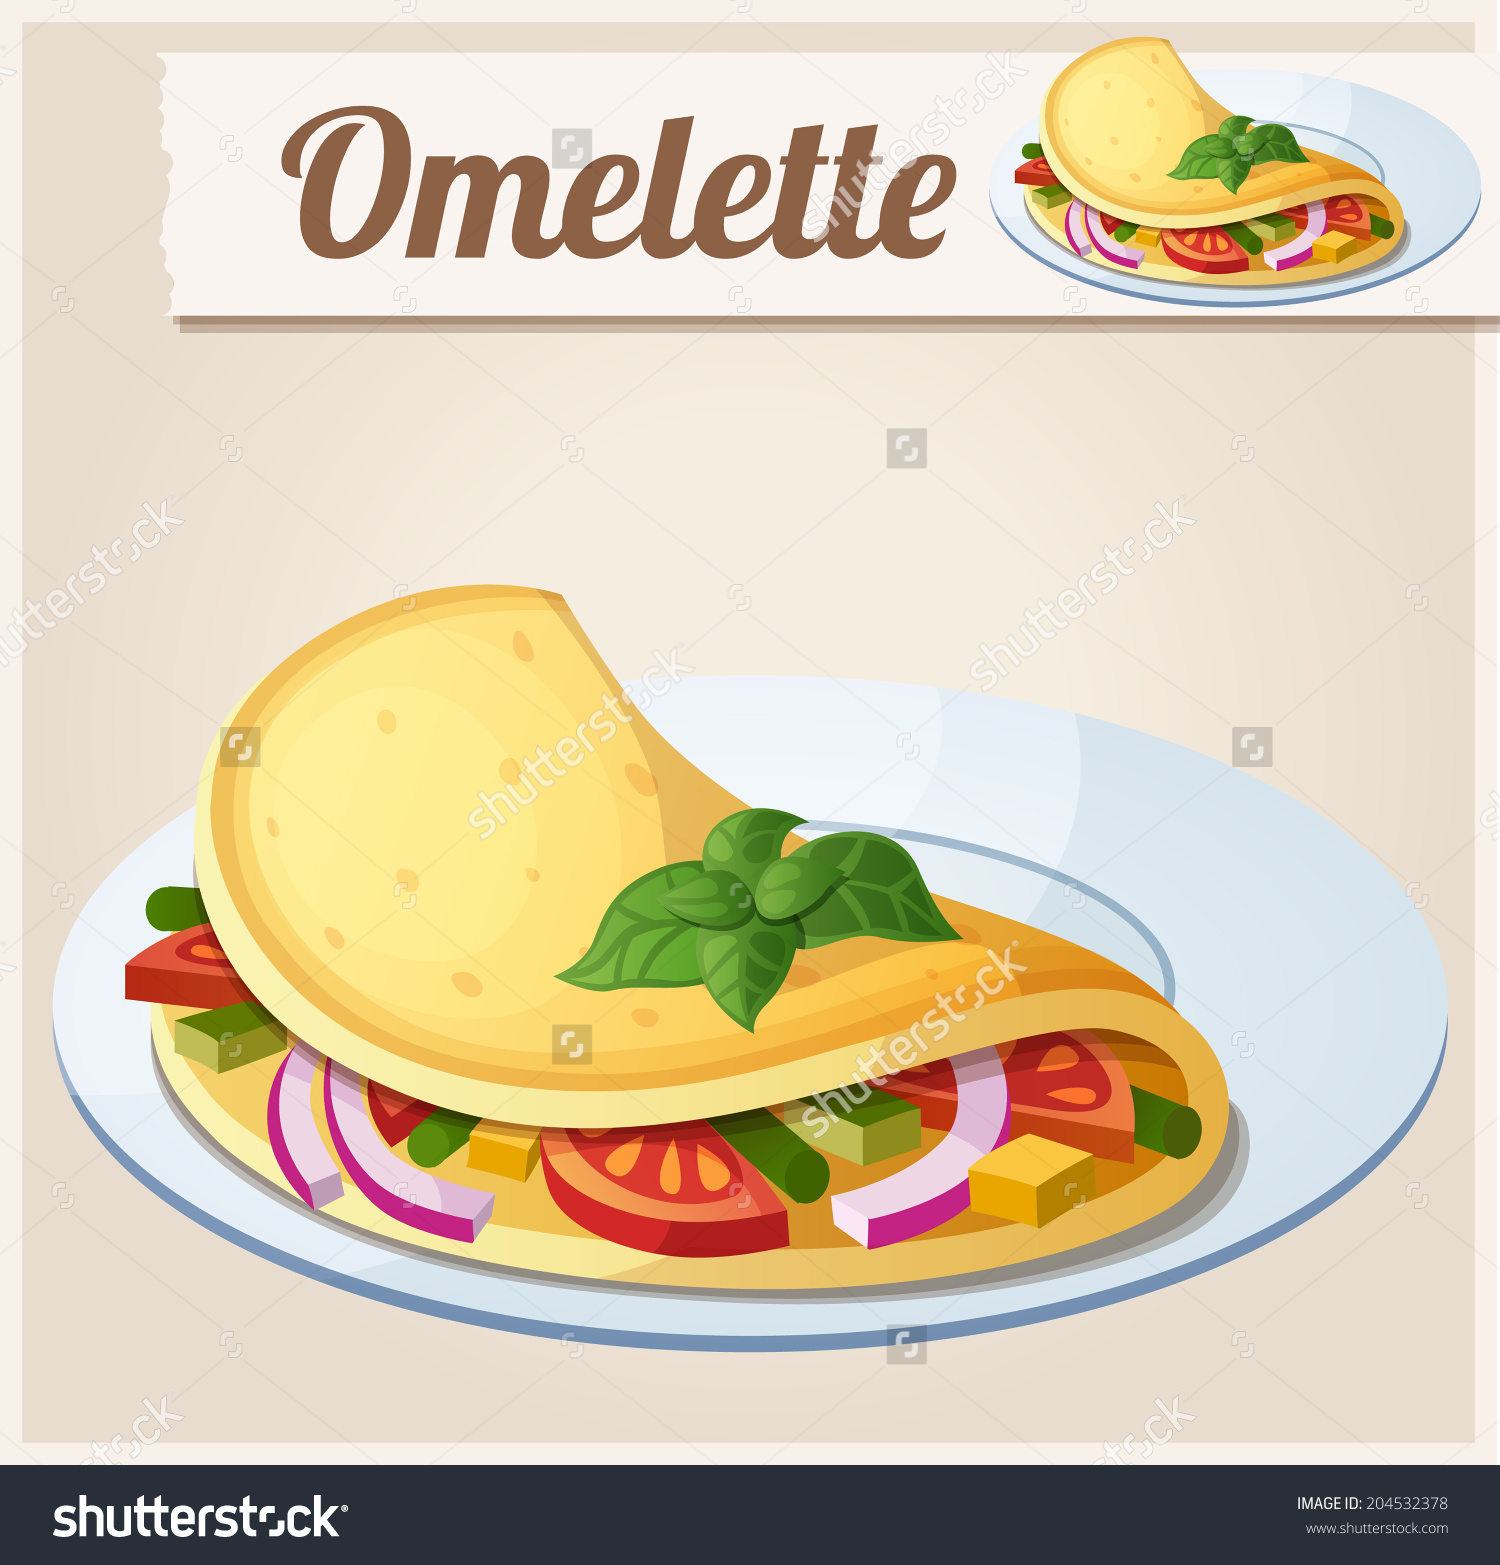 Omelette clipart black and white.